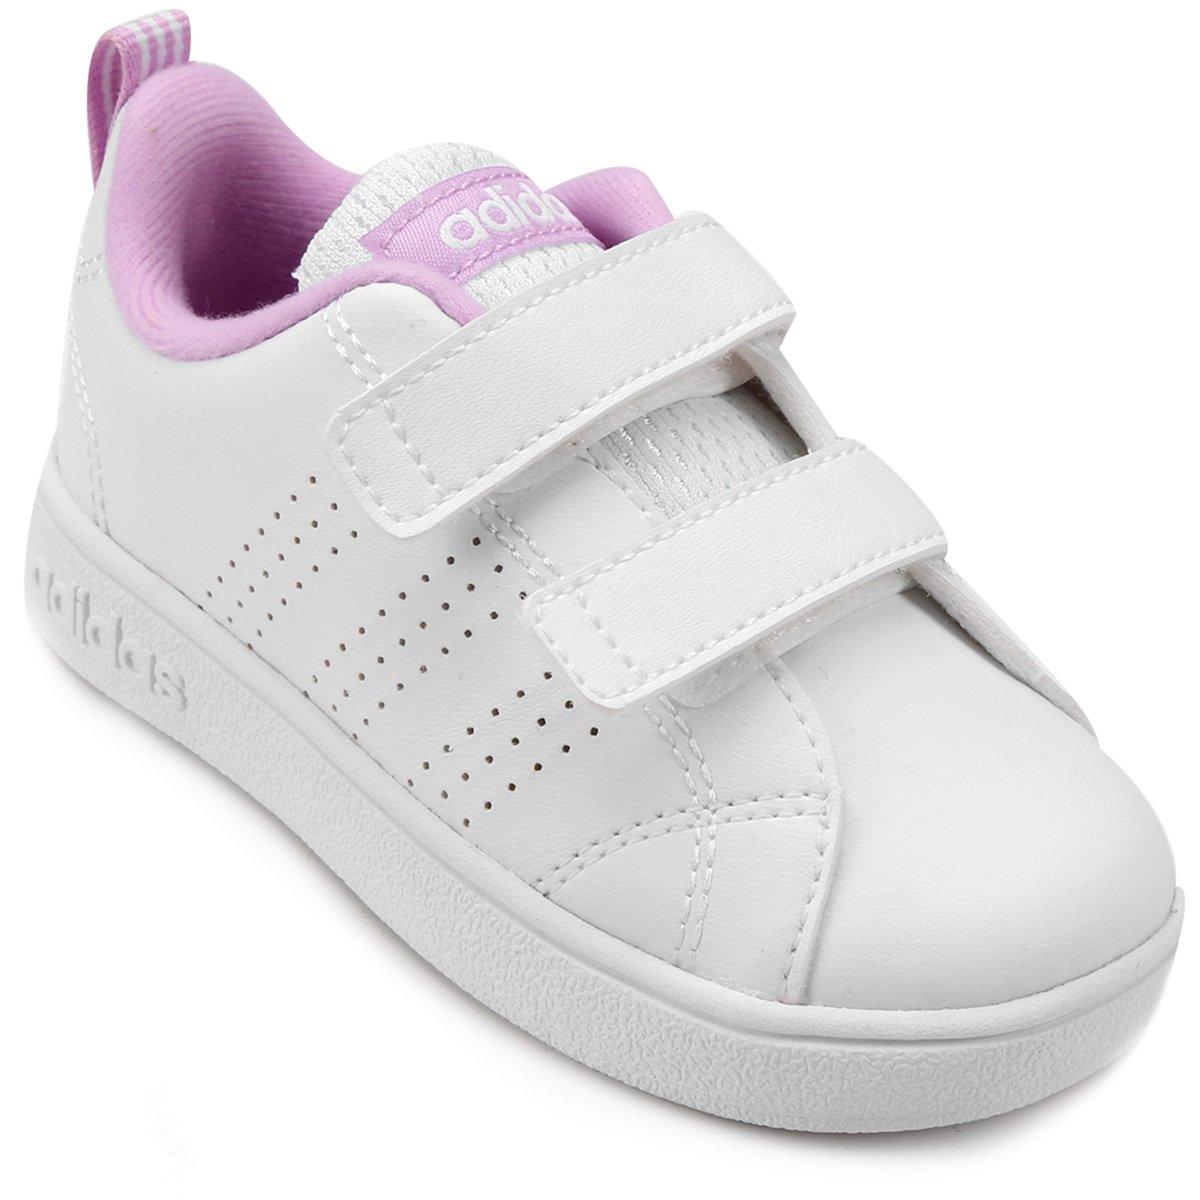 a5482350f4 Tênis Adidas Vs Advantage Clean Infantil Compre Agora Zattini